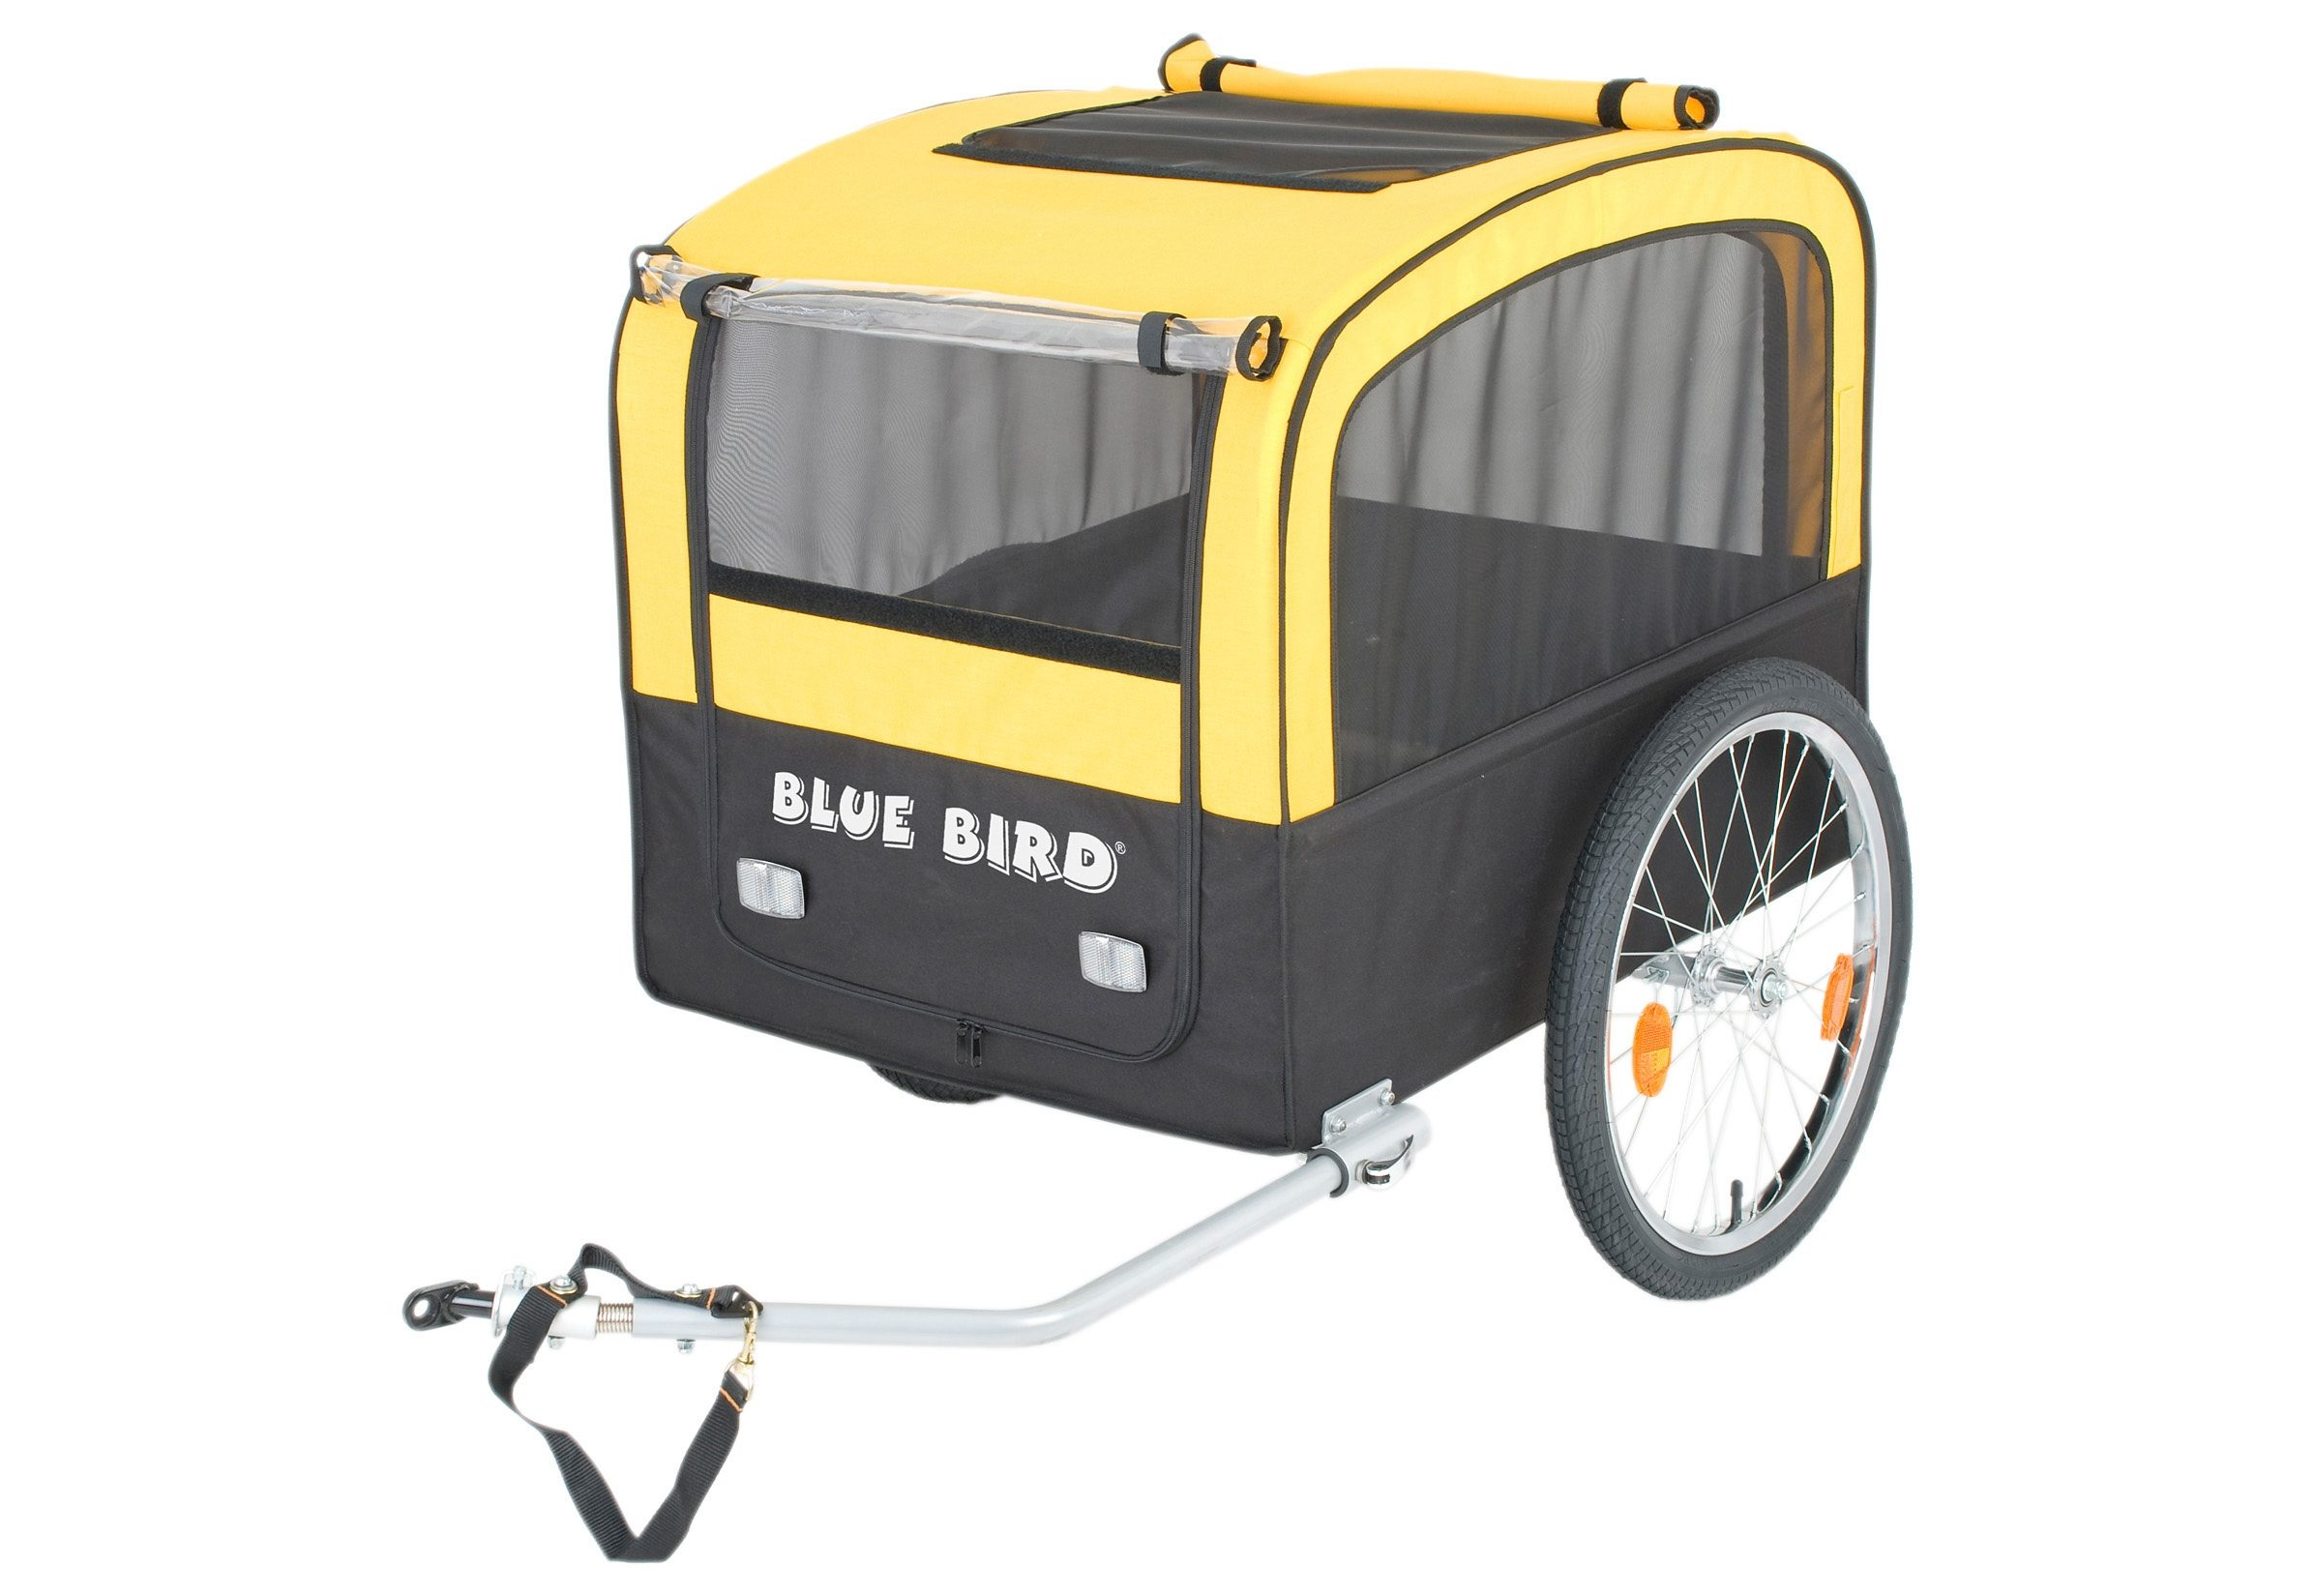 Blue Bird Fahrrad Hundeanhänger, 20 Zoll, gelb-schwarz